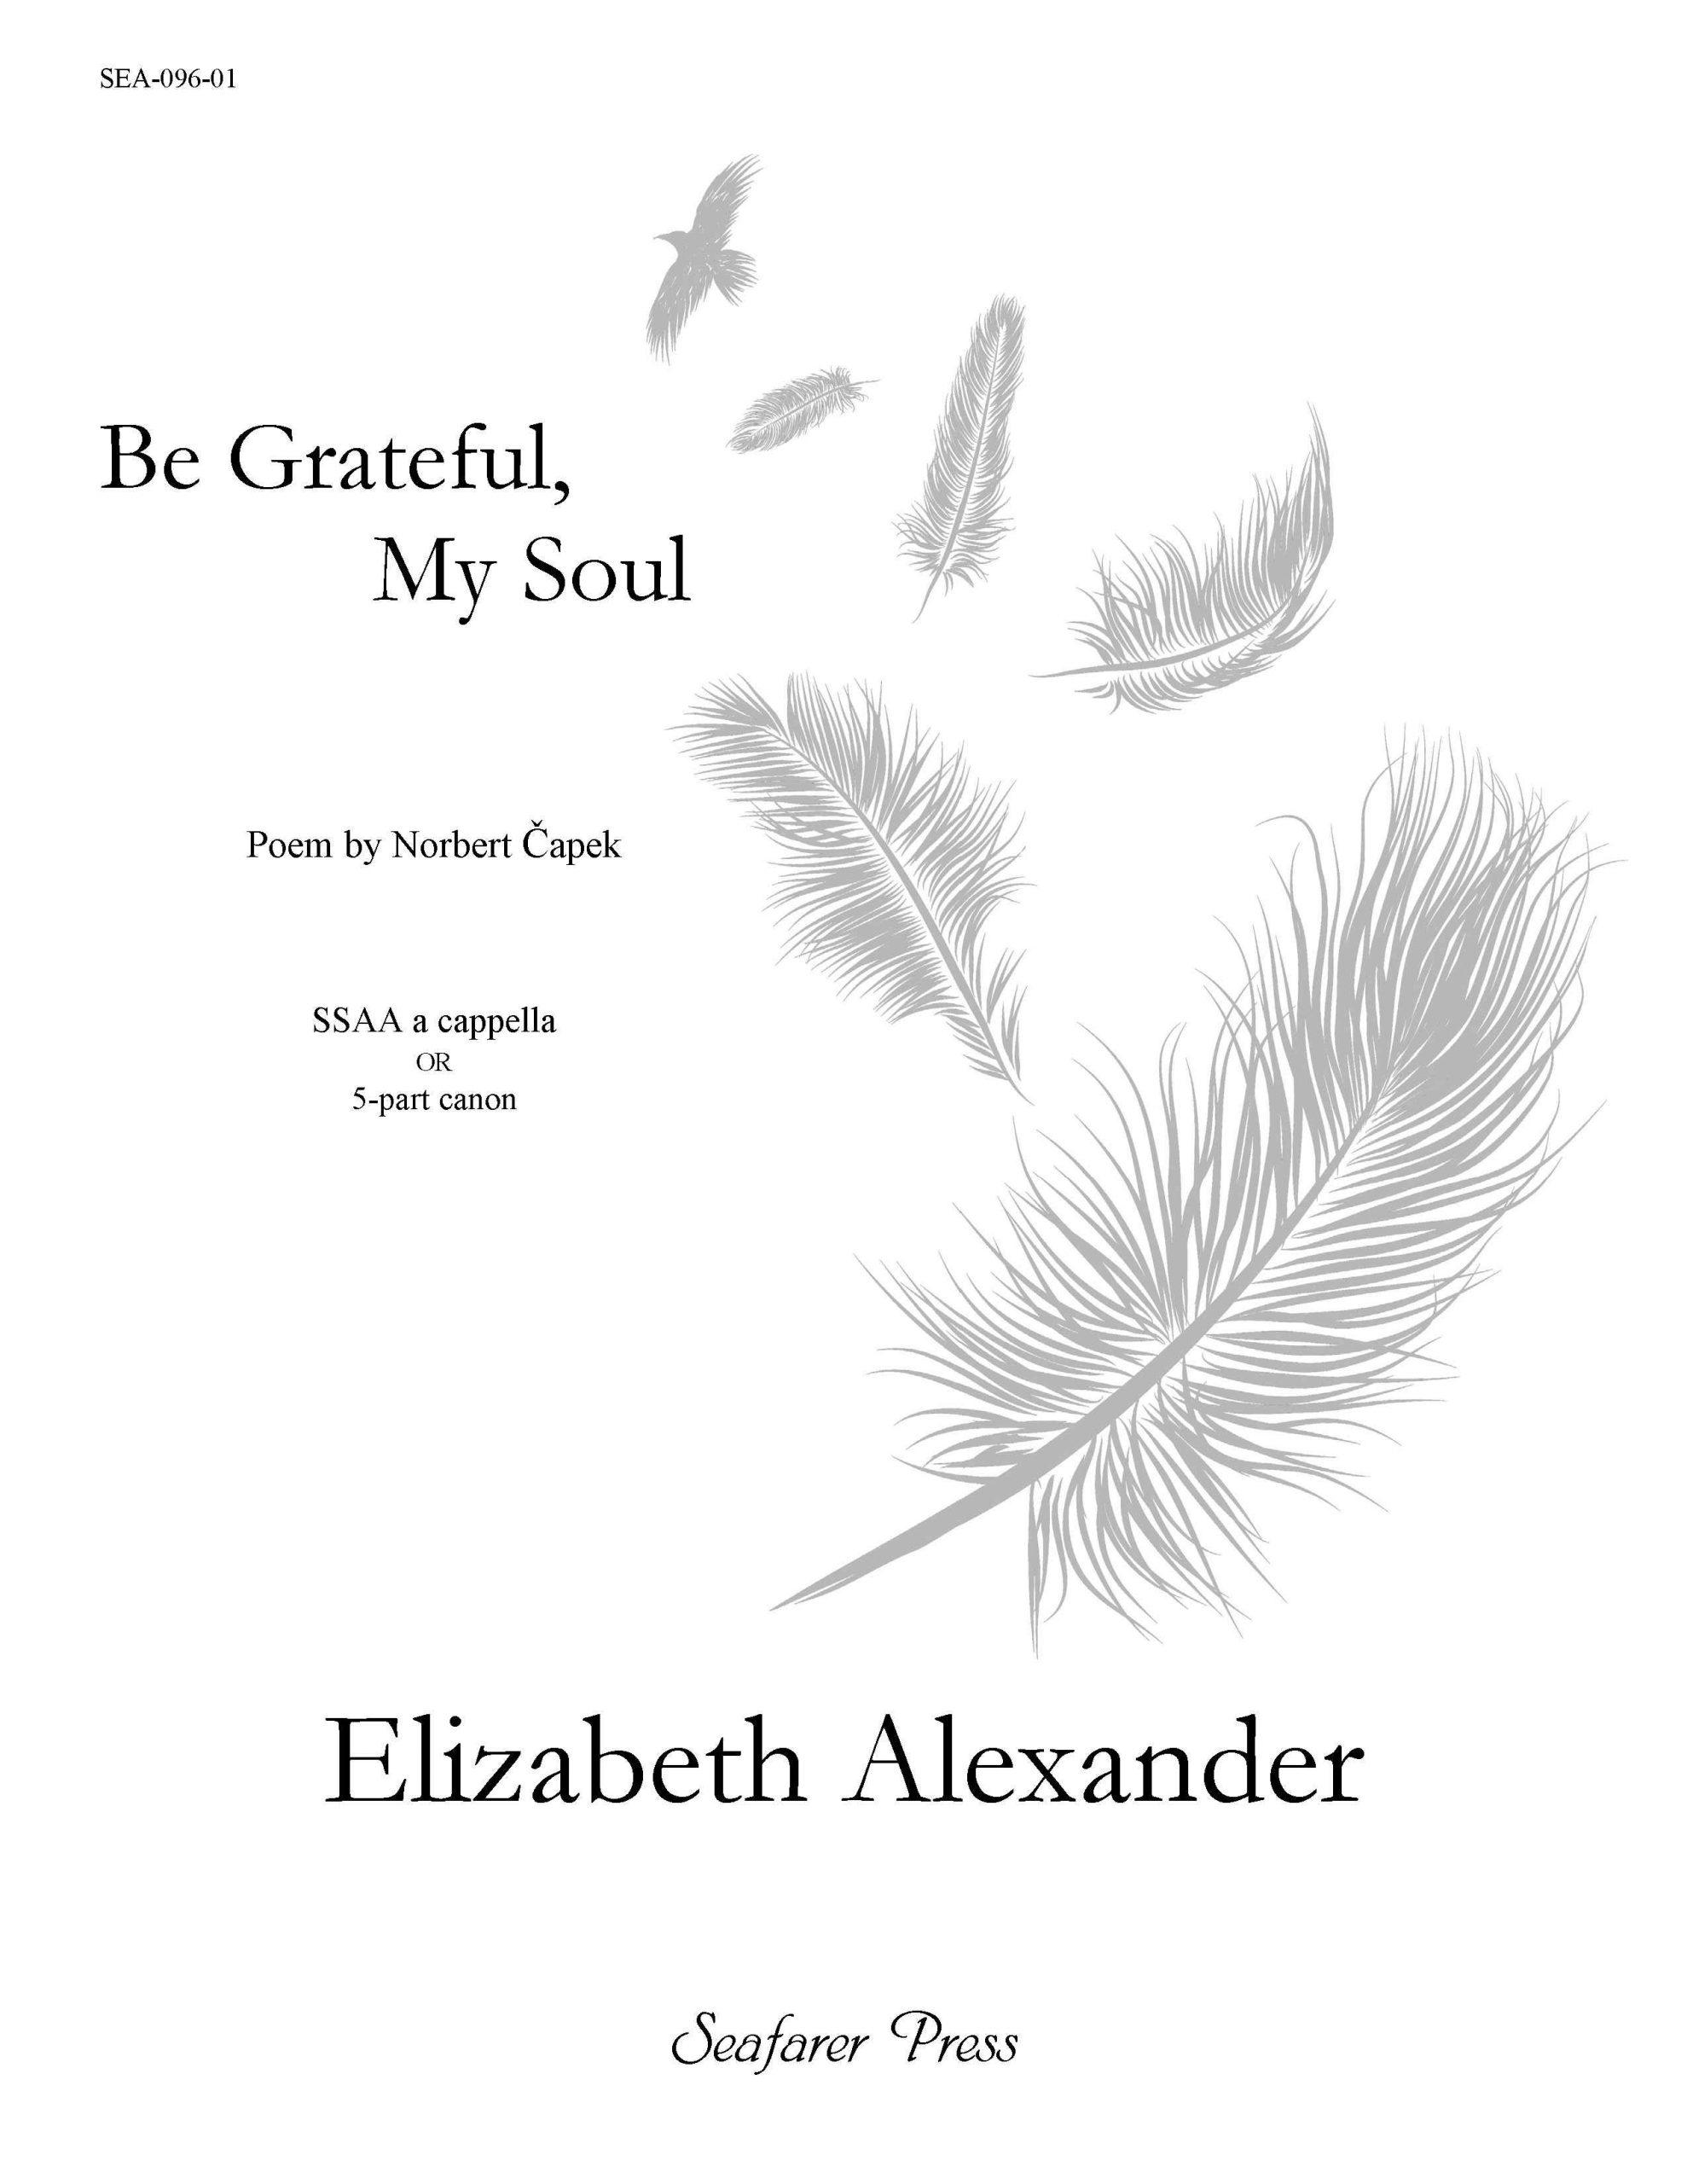 SEA-096-01 - Be Grateful, My Soul